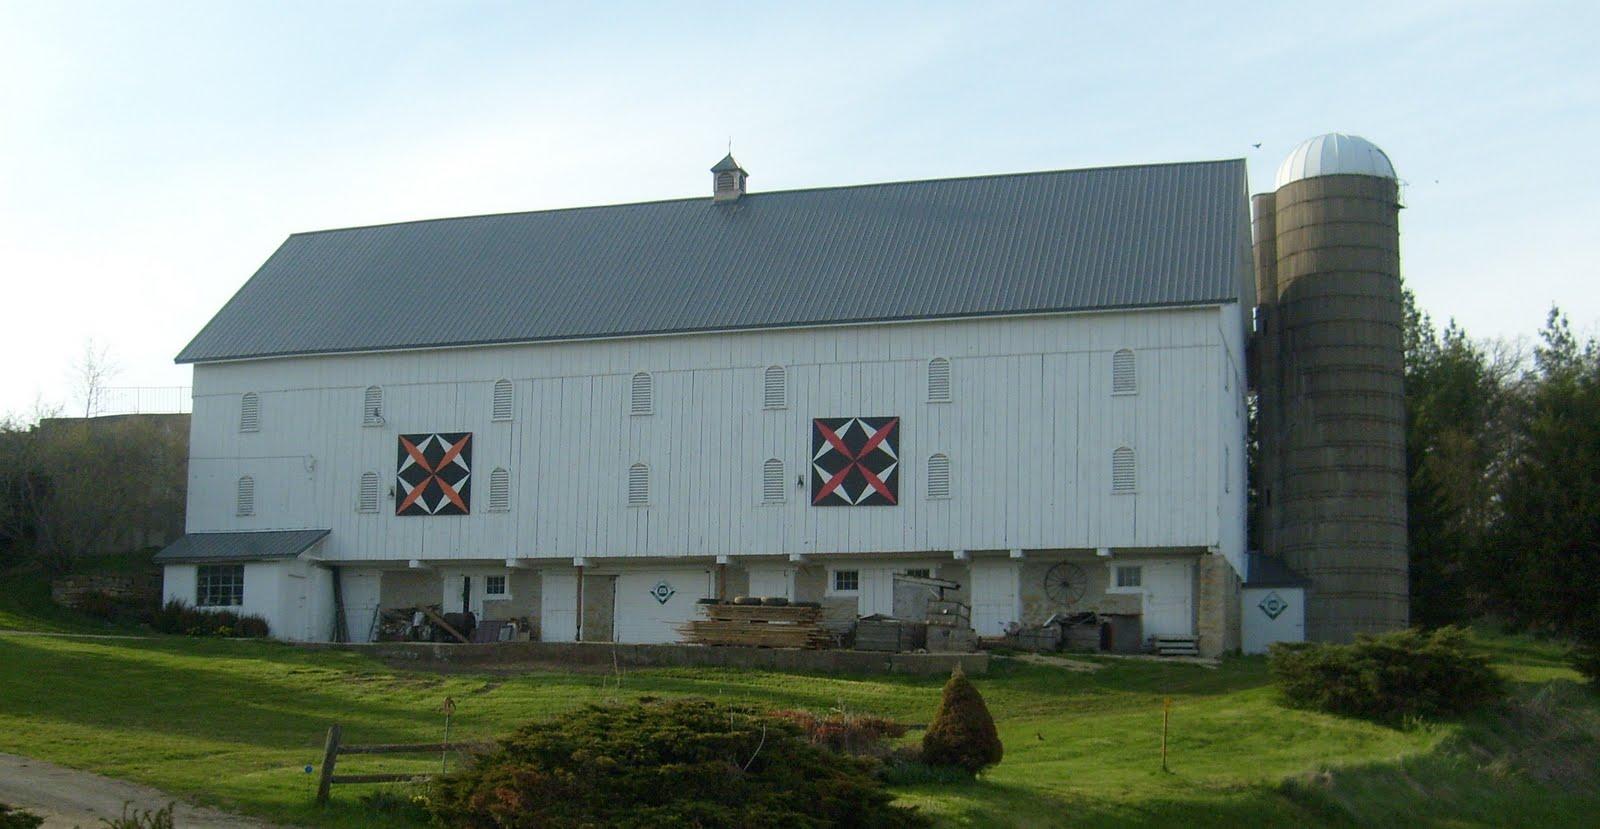 barn................the